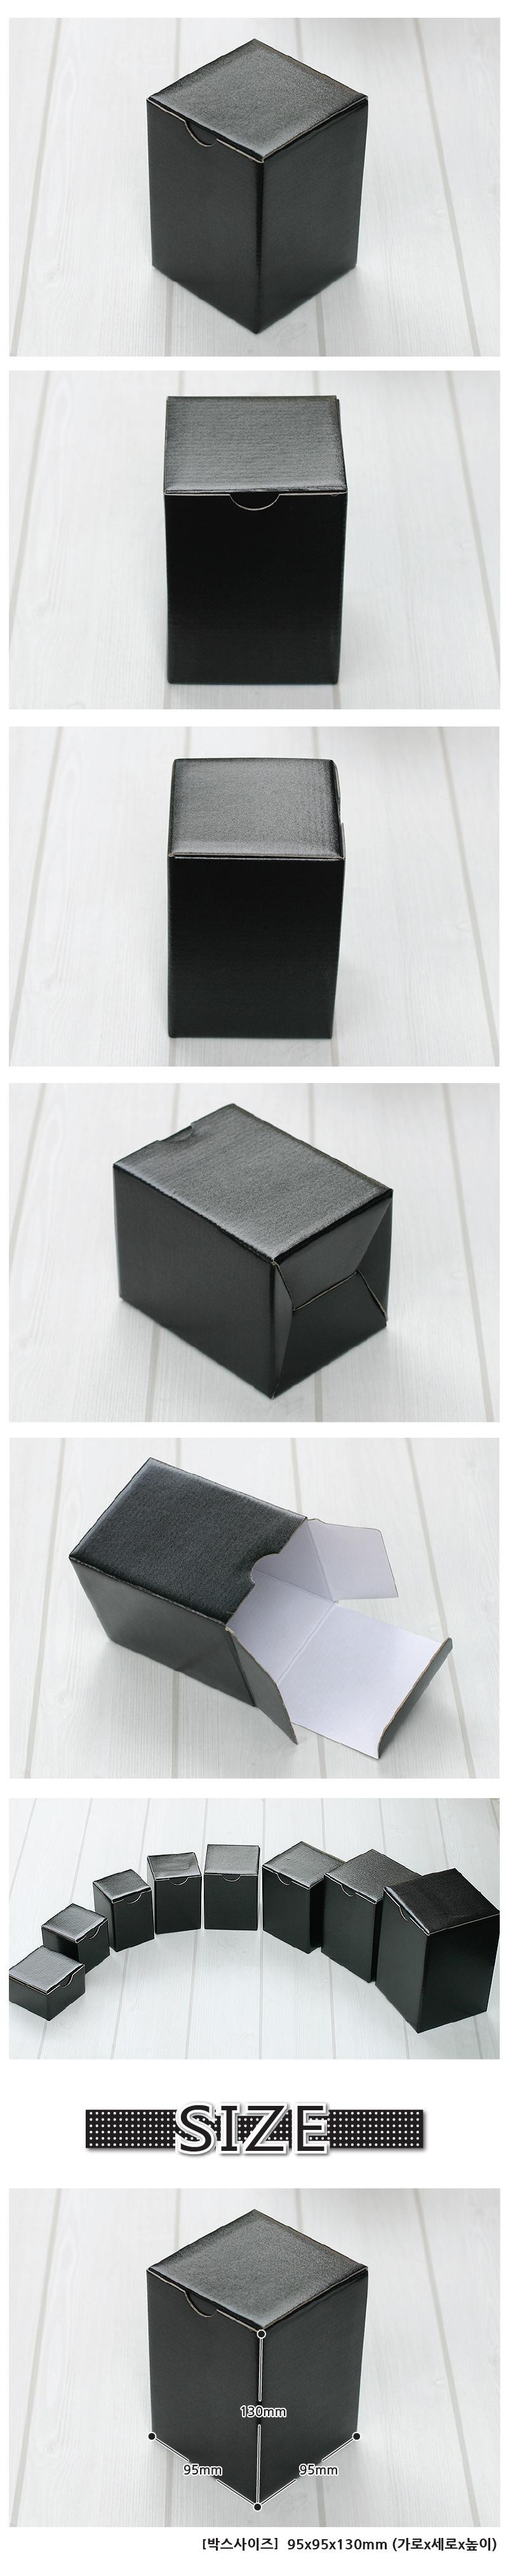 blackpearl-candle-7.jpg